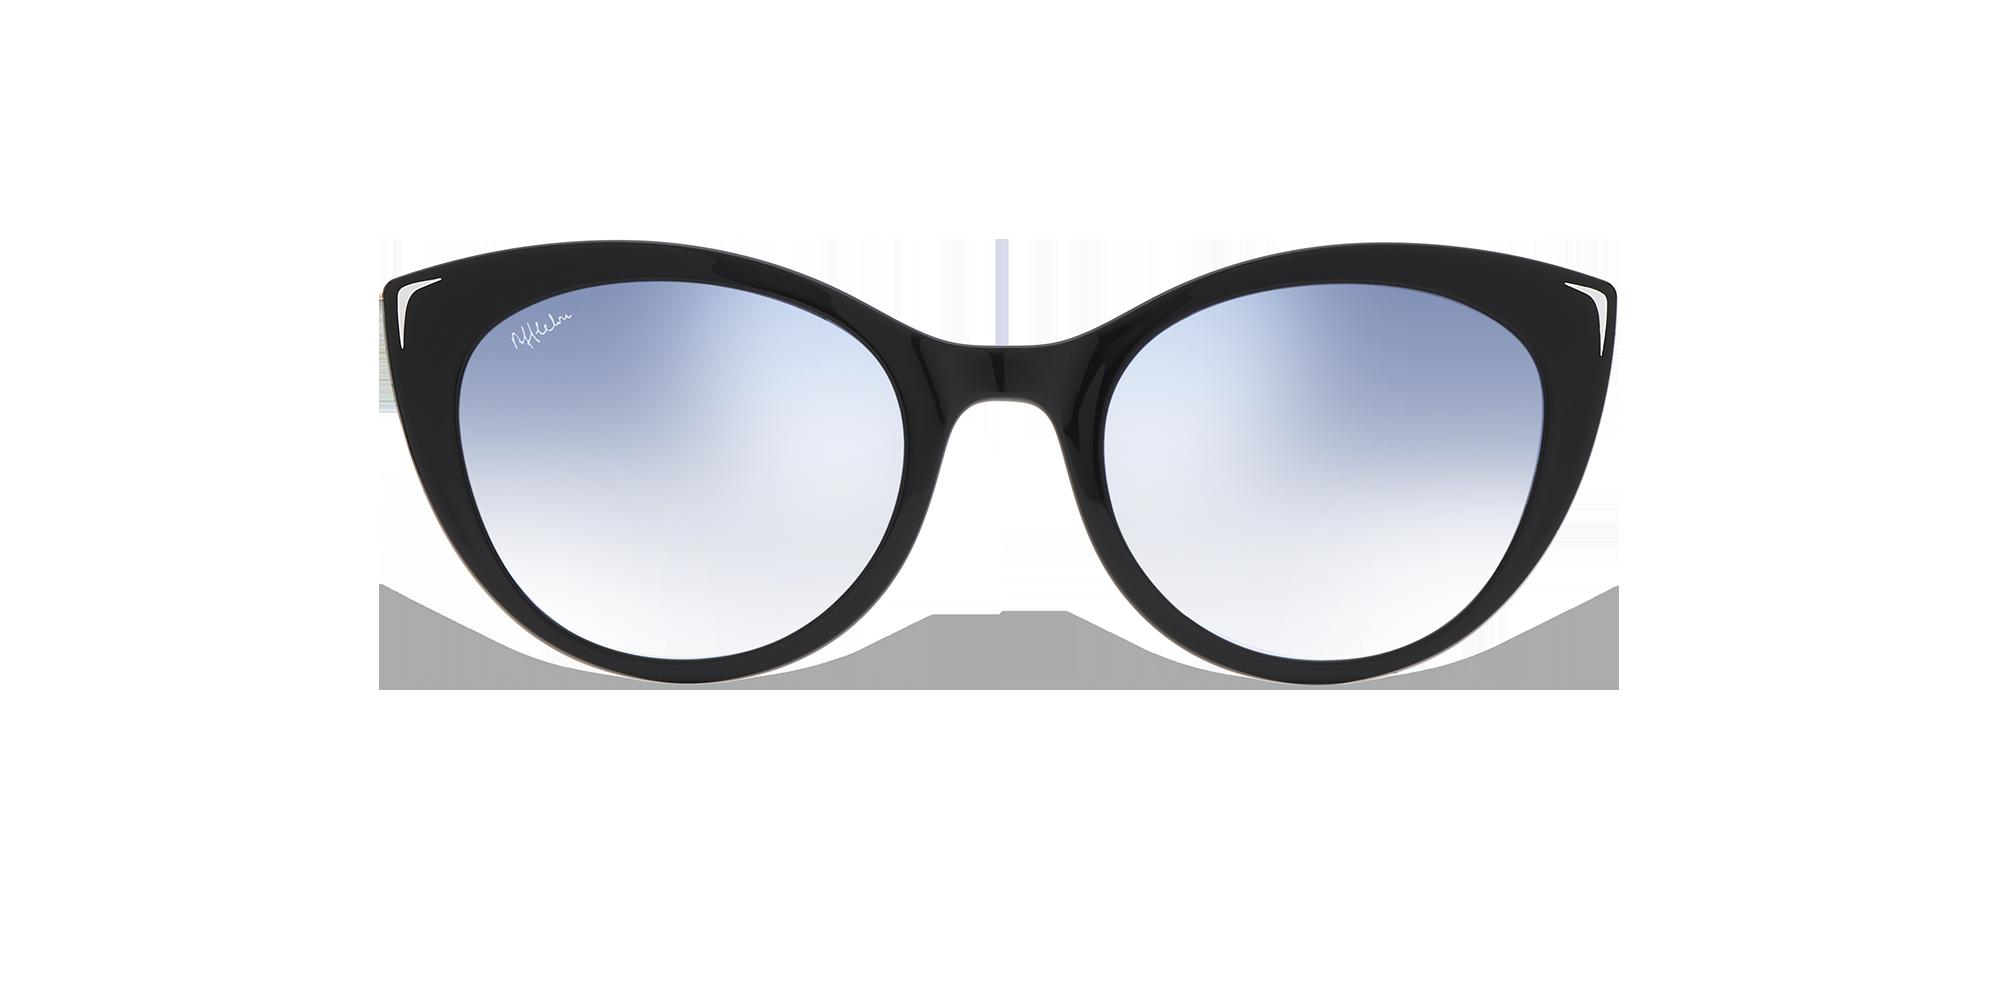 afflelou/france/products/smart_clip/clips_glasses/TMK36XLBK014819.png